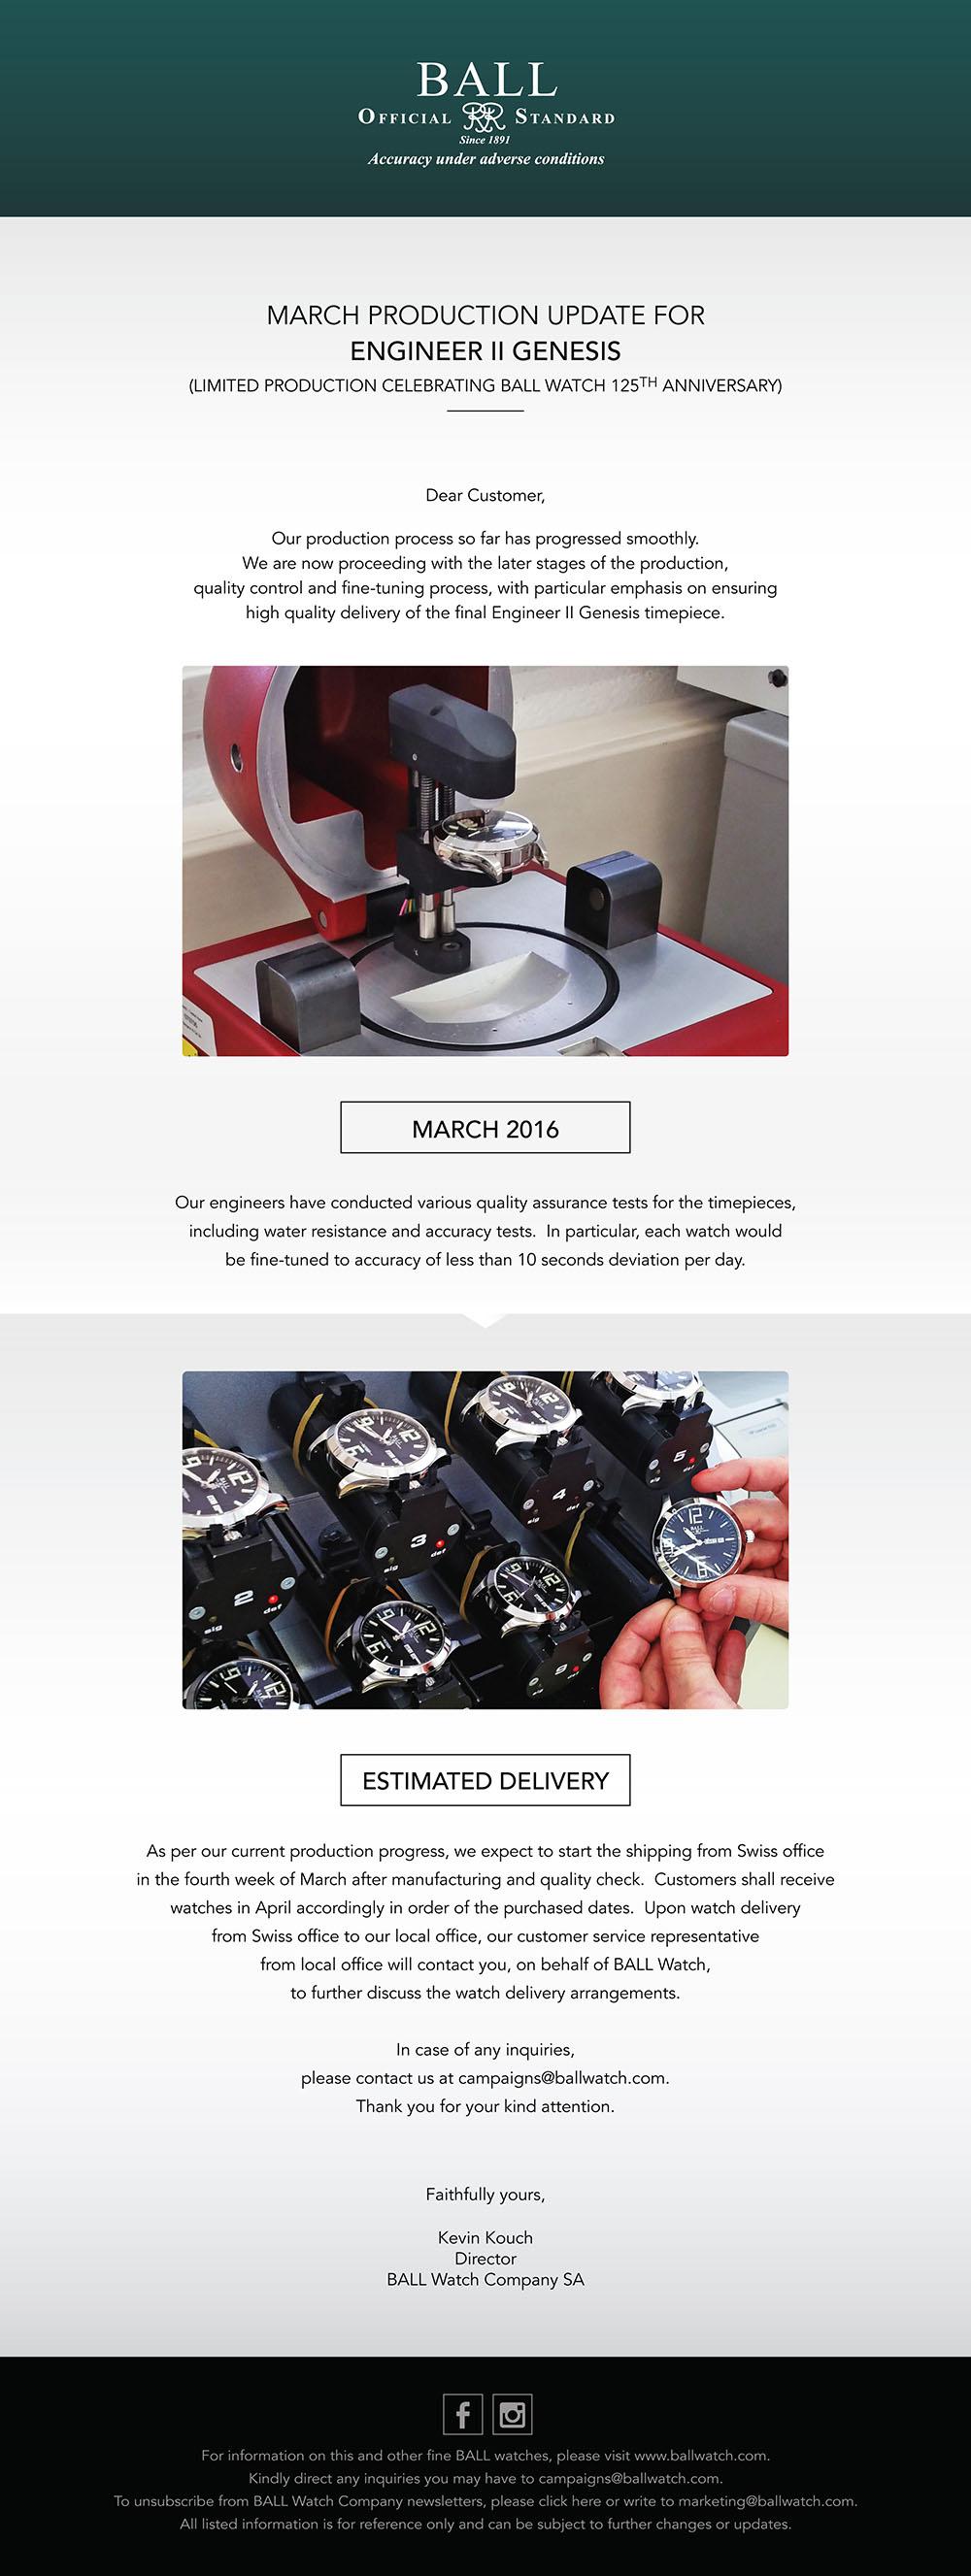 Ball Watch Newsletter Genesis Production Update